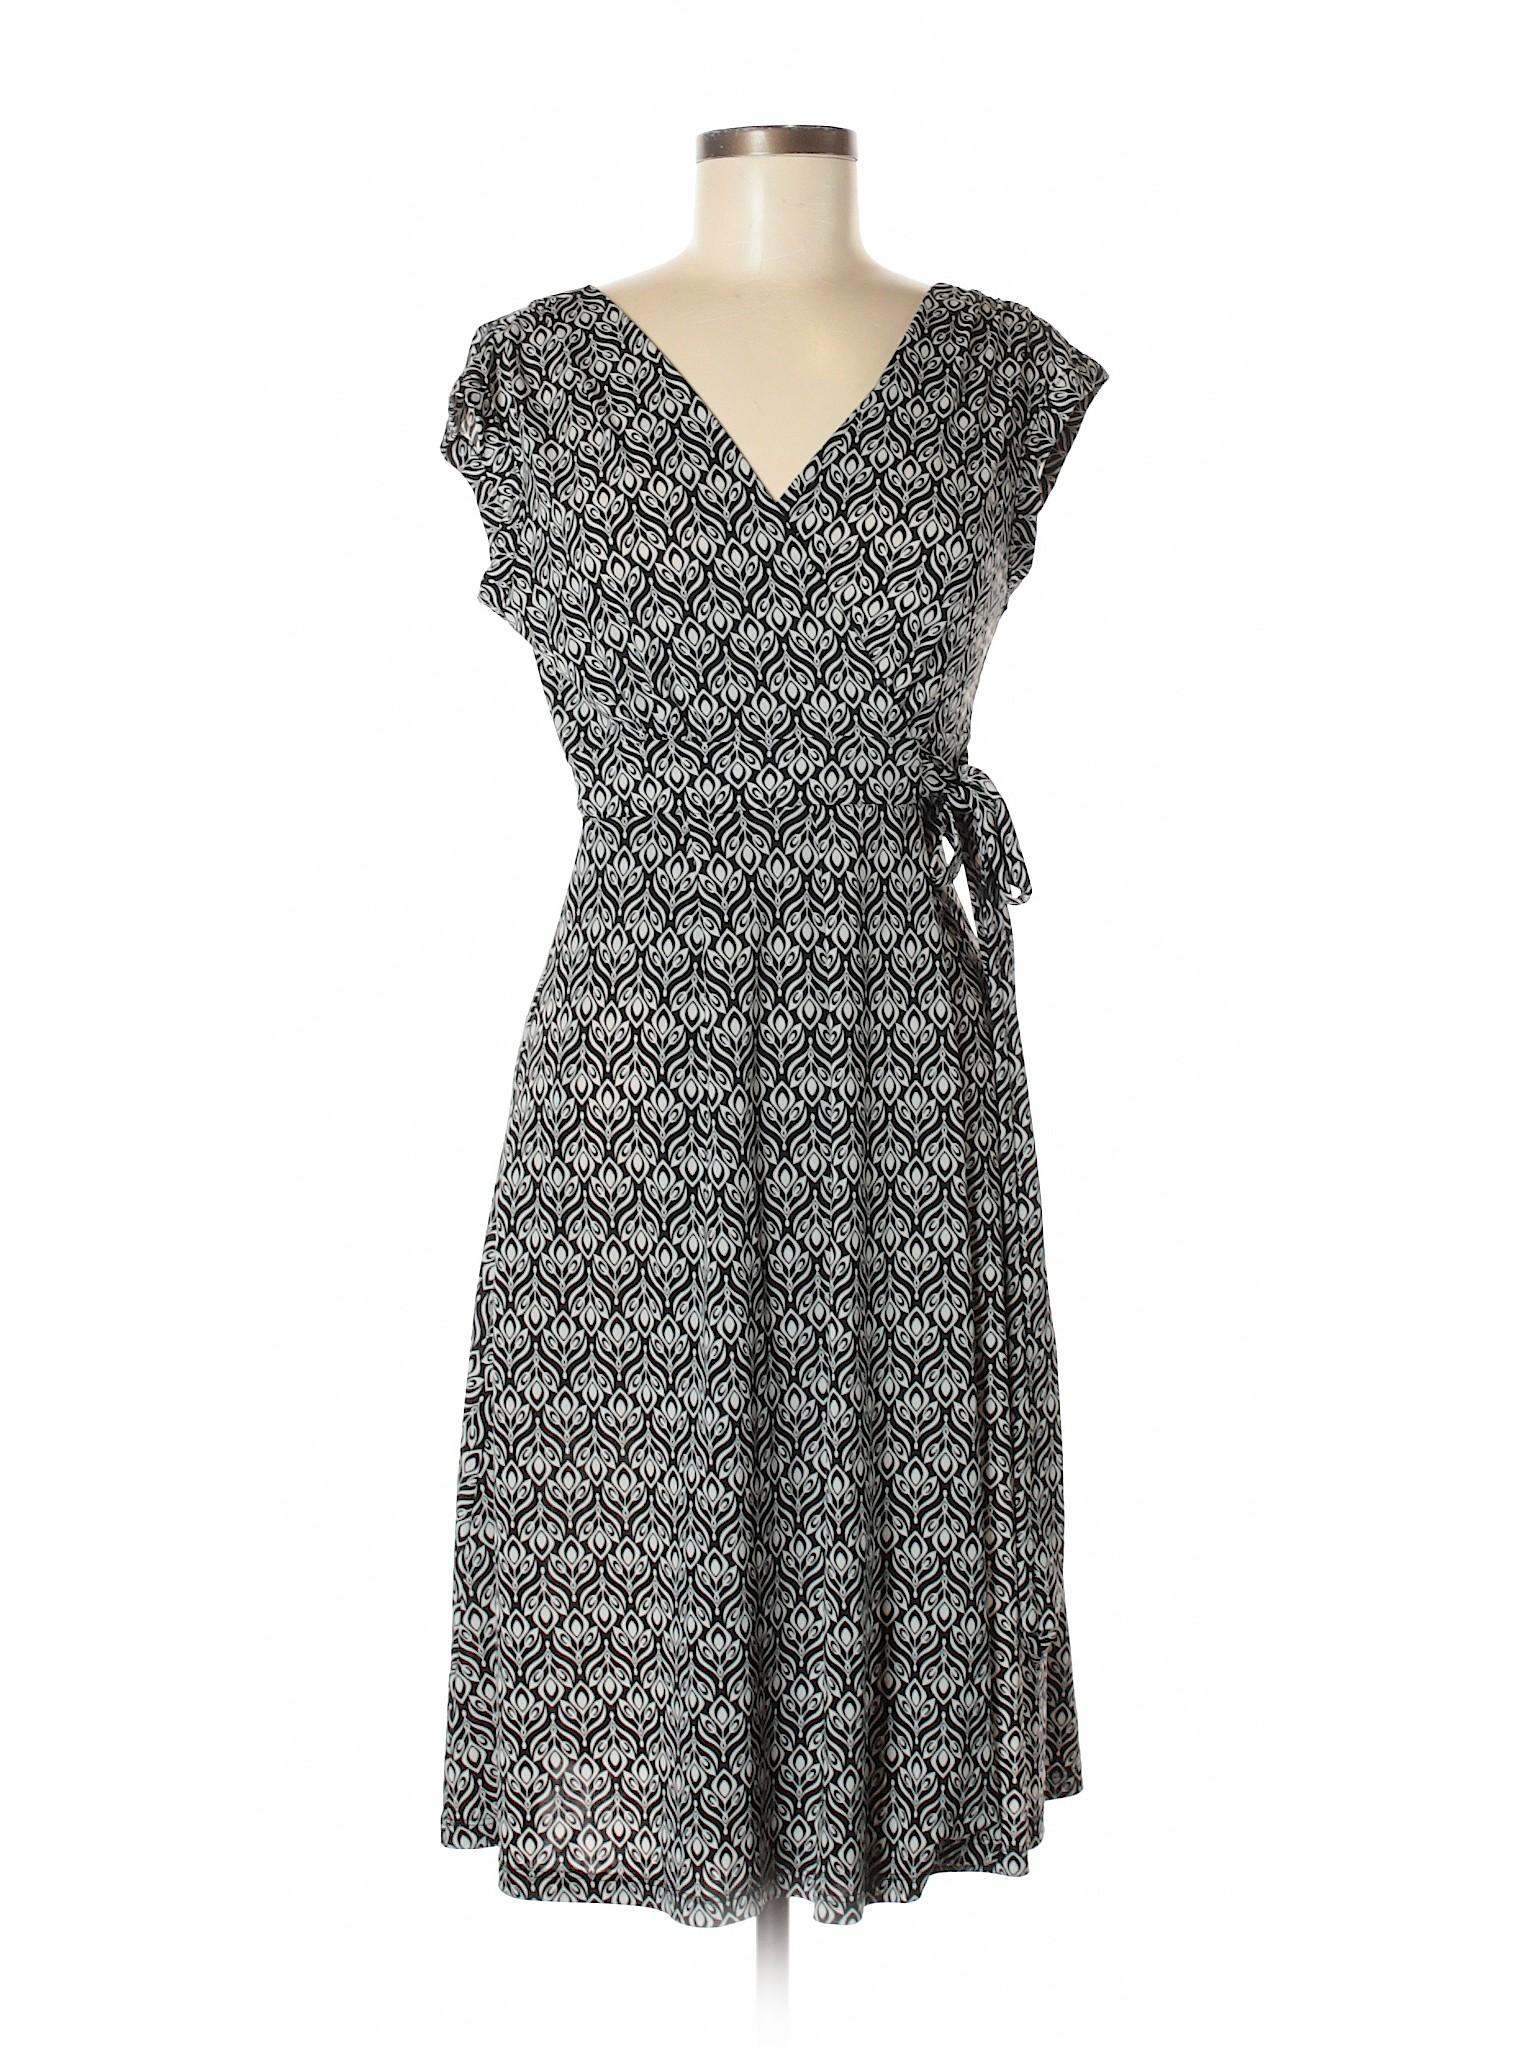 Boutique S Casual Twelve Dress winter X7T8a6Tn